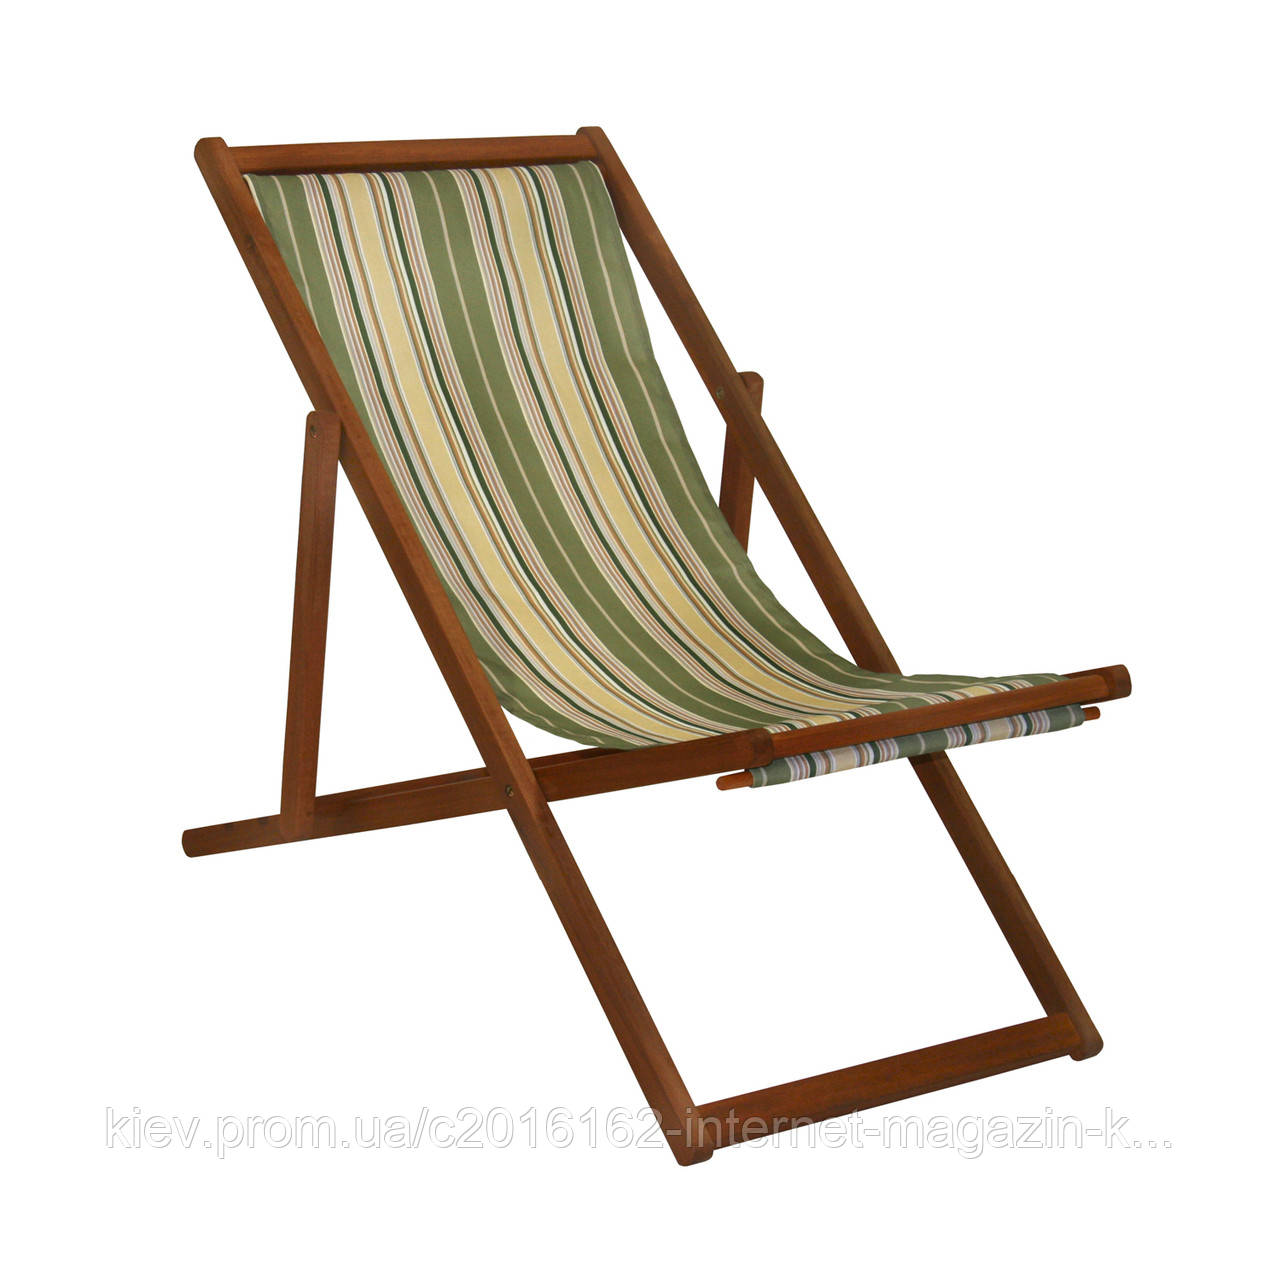 Шезлонг деревянный для сада ретро Garden4you KASA  109 5x59 5xH83 5cm beige striped